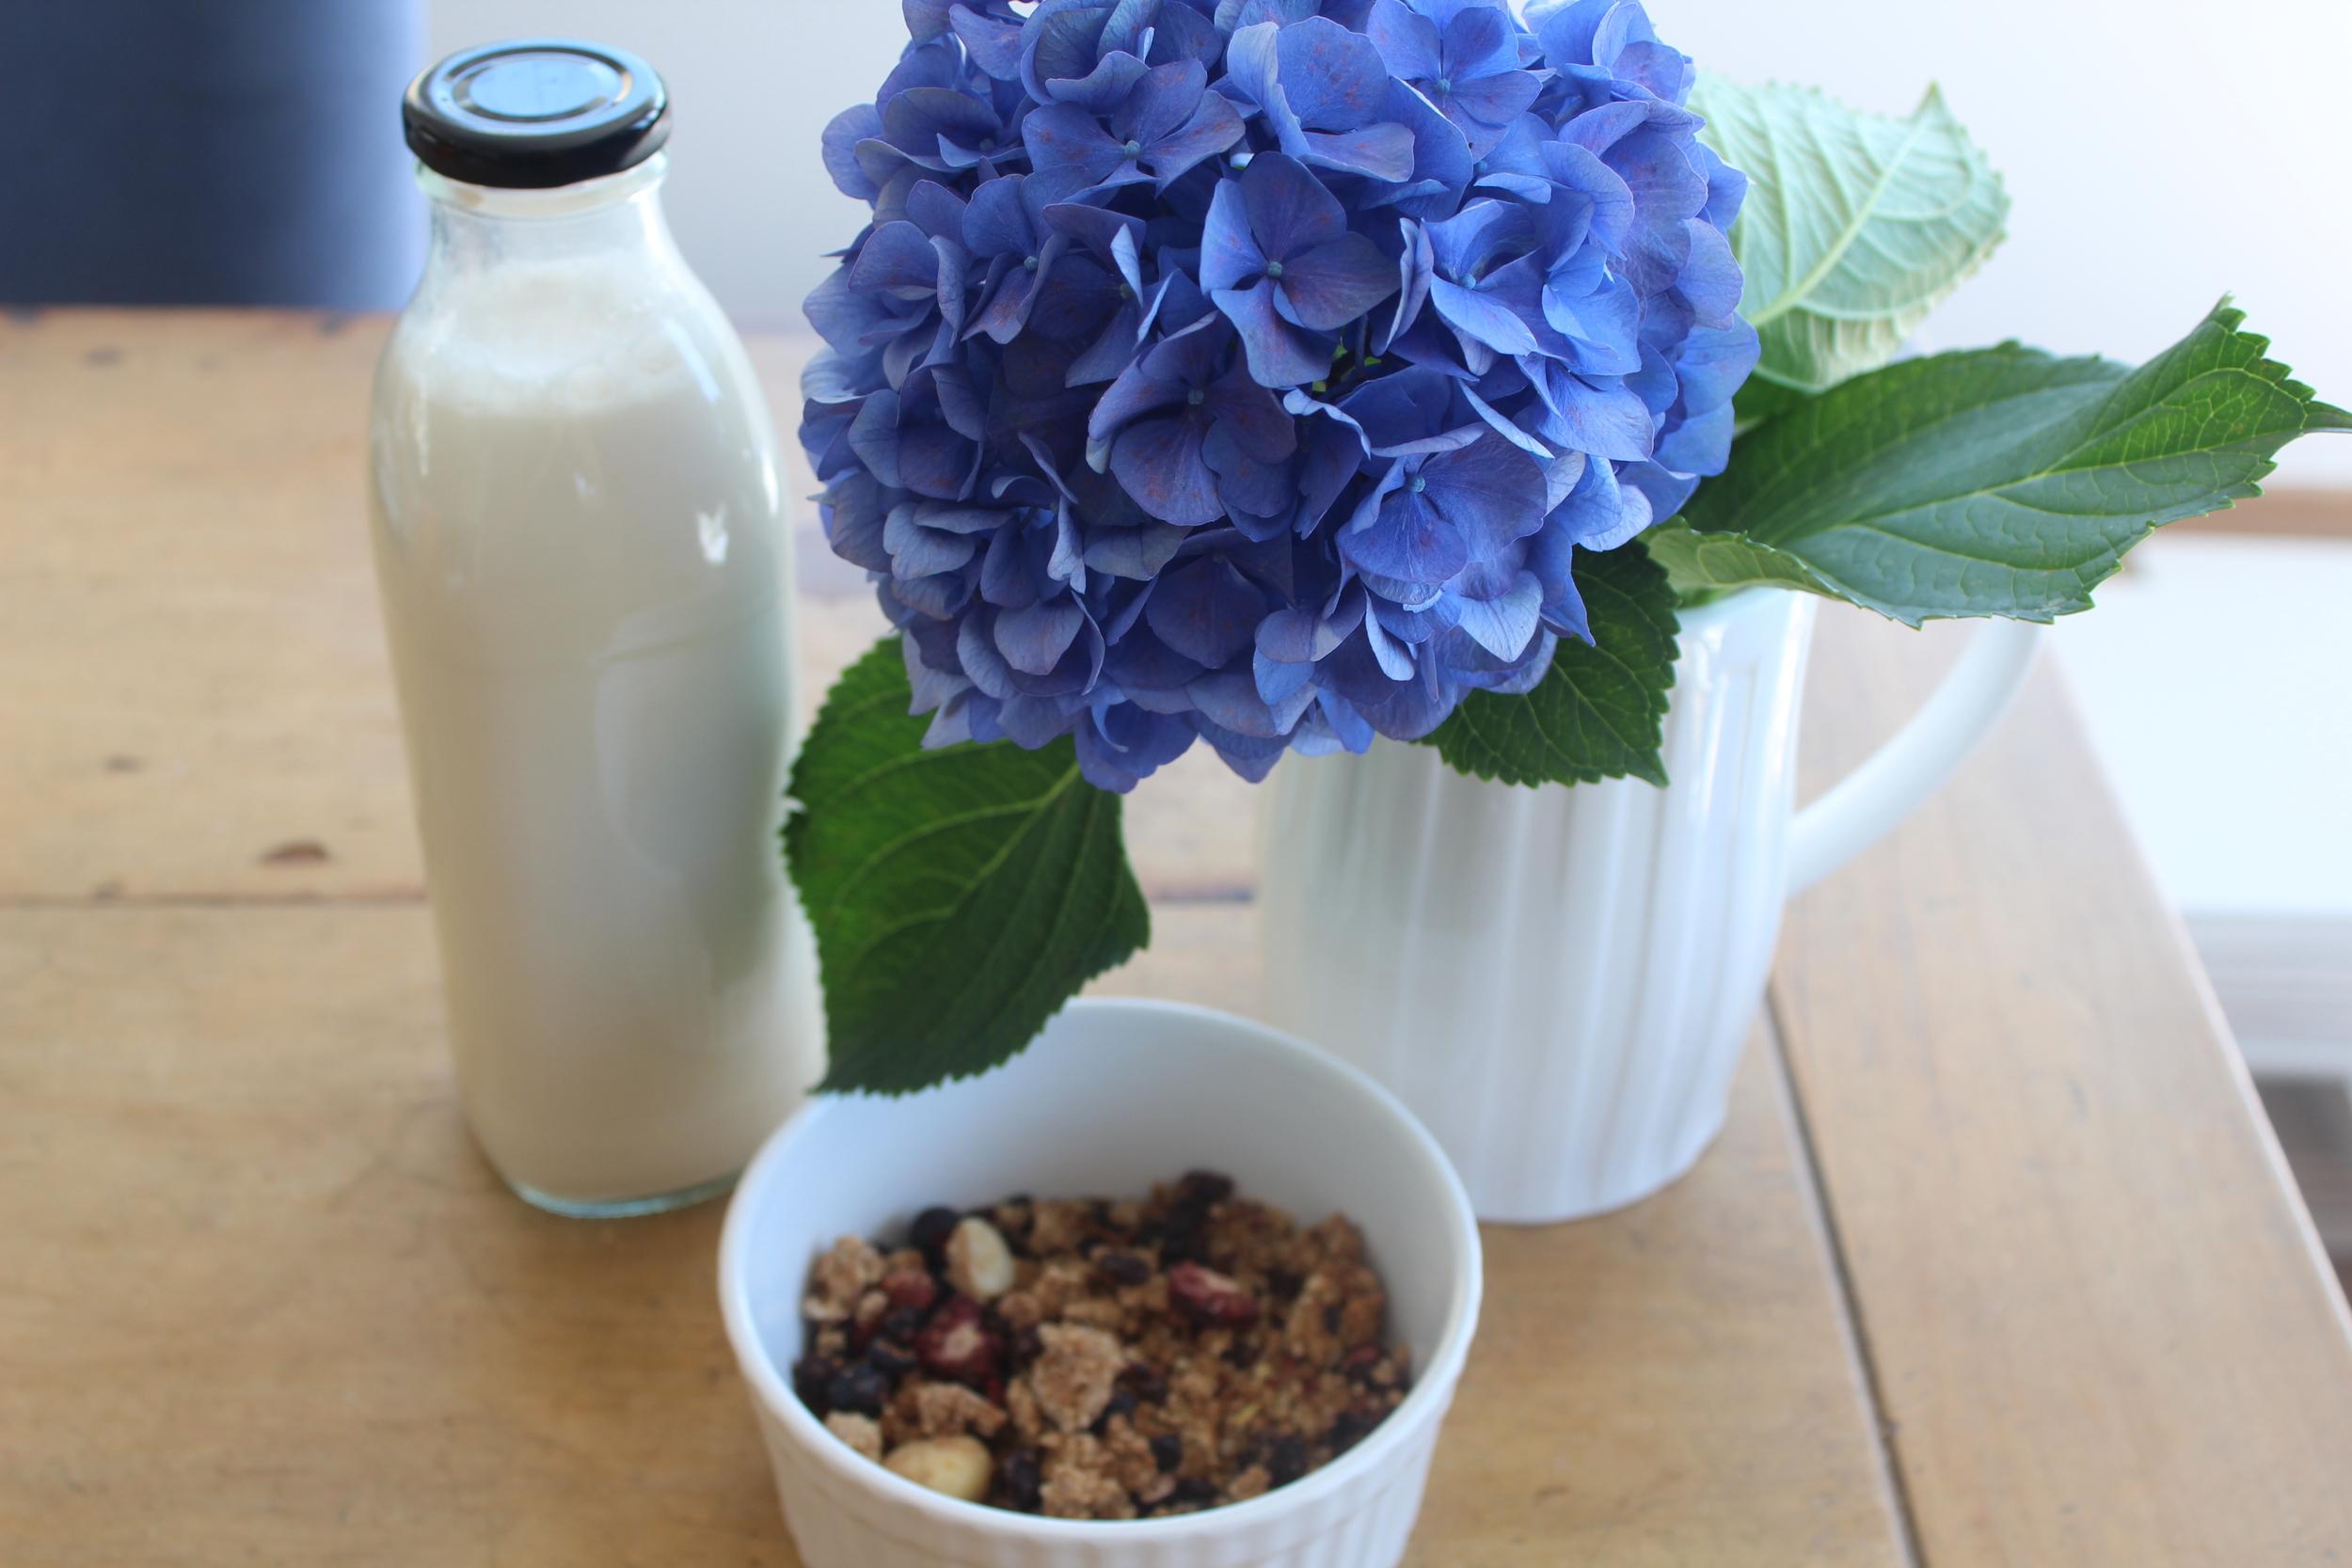 CREAMY ALMOND MILK - sugar free, calcium, protein, vegan,plant based, dairy free, gluten free,  whole foods, no refined sugar, nut milk, recipe, easy  , natural  , recoveringraw.com, recoveringraw